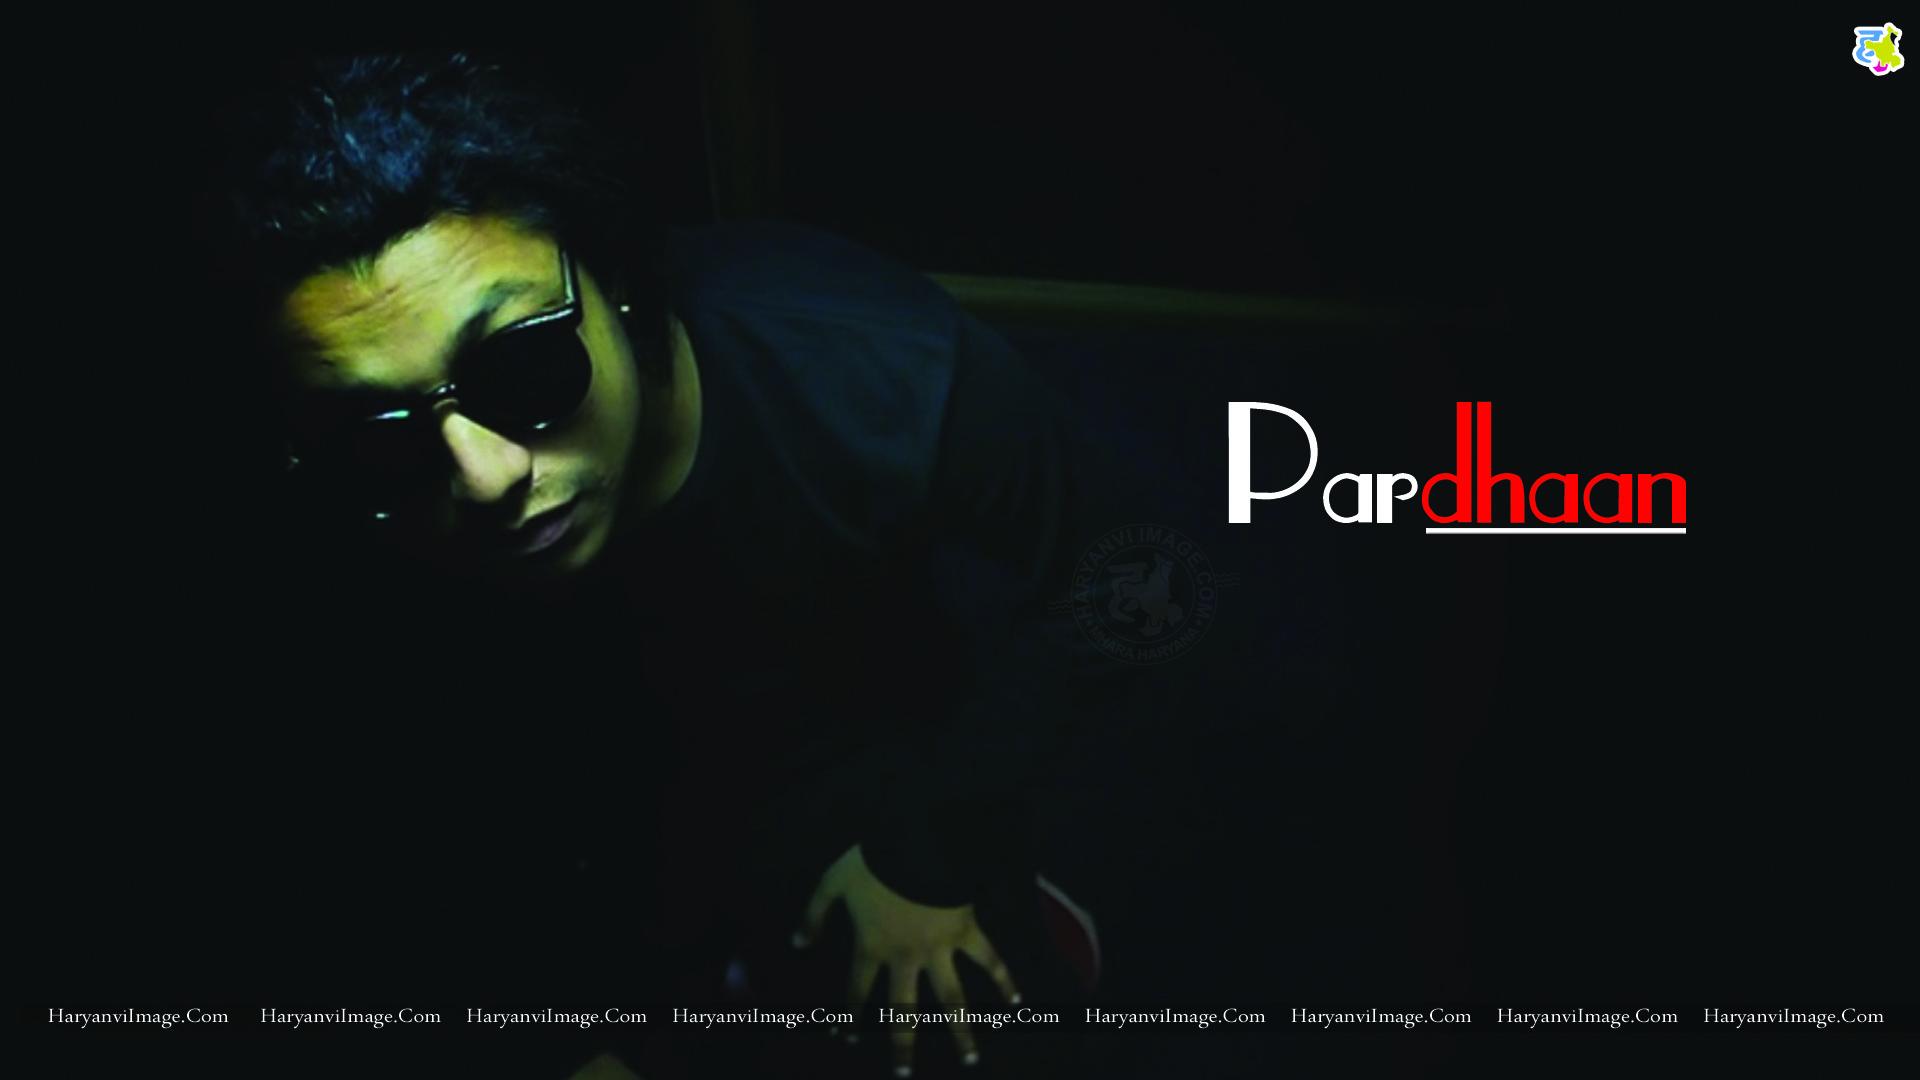 Pardhaan Singer Rapper HD Wallpaper haryanvi Image